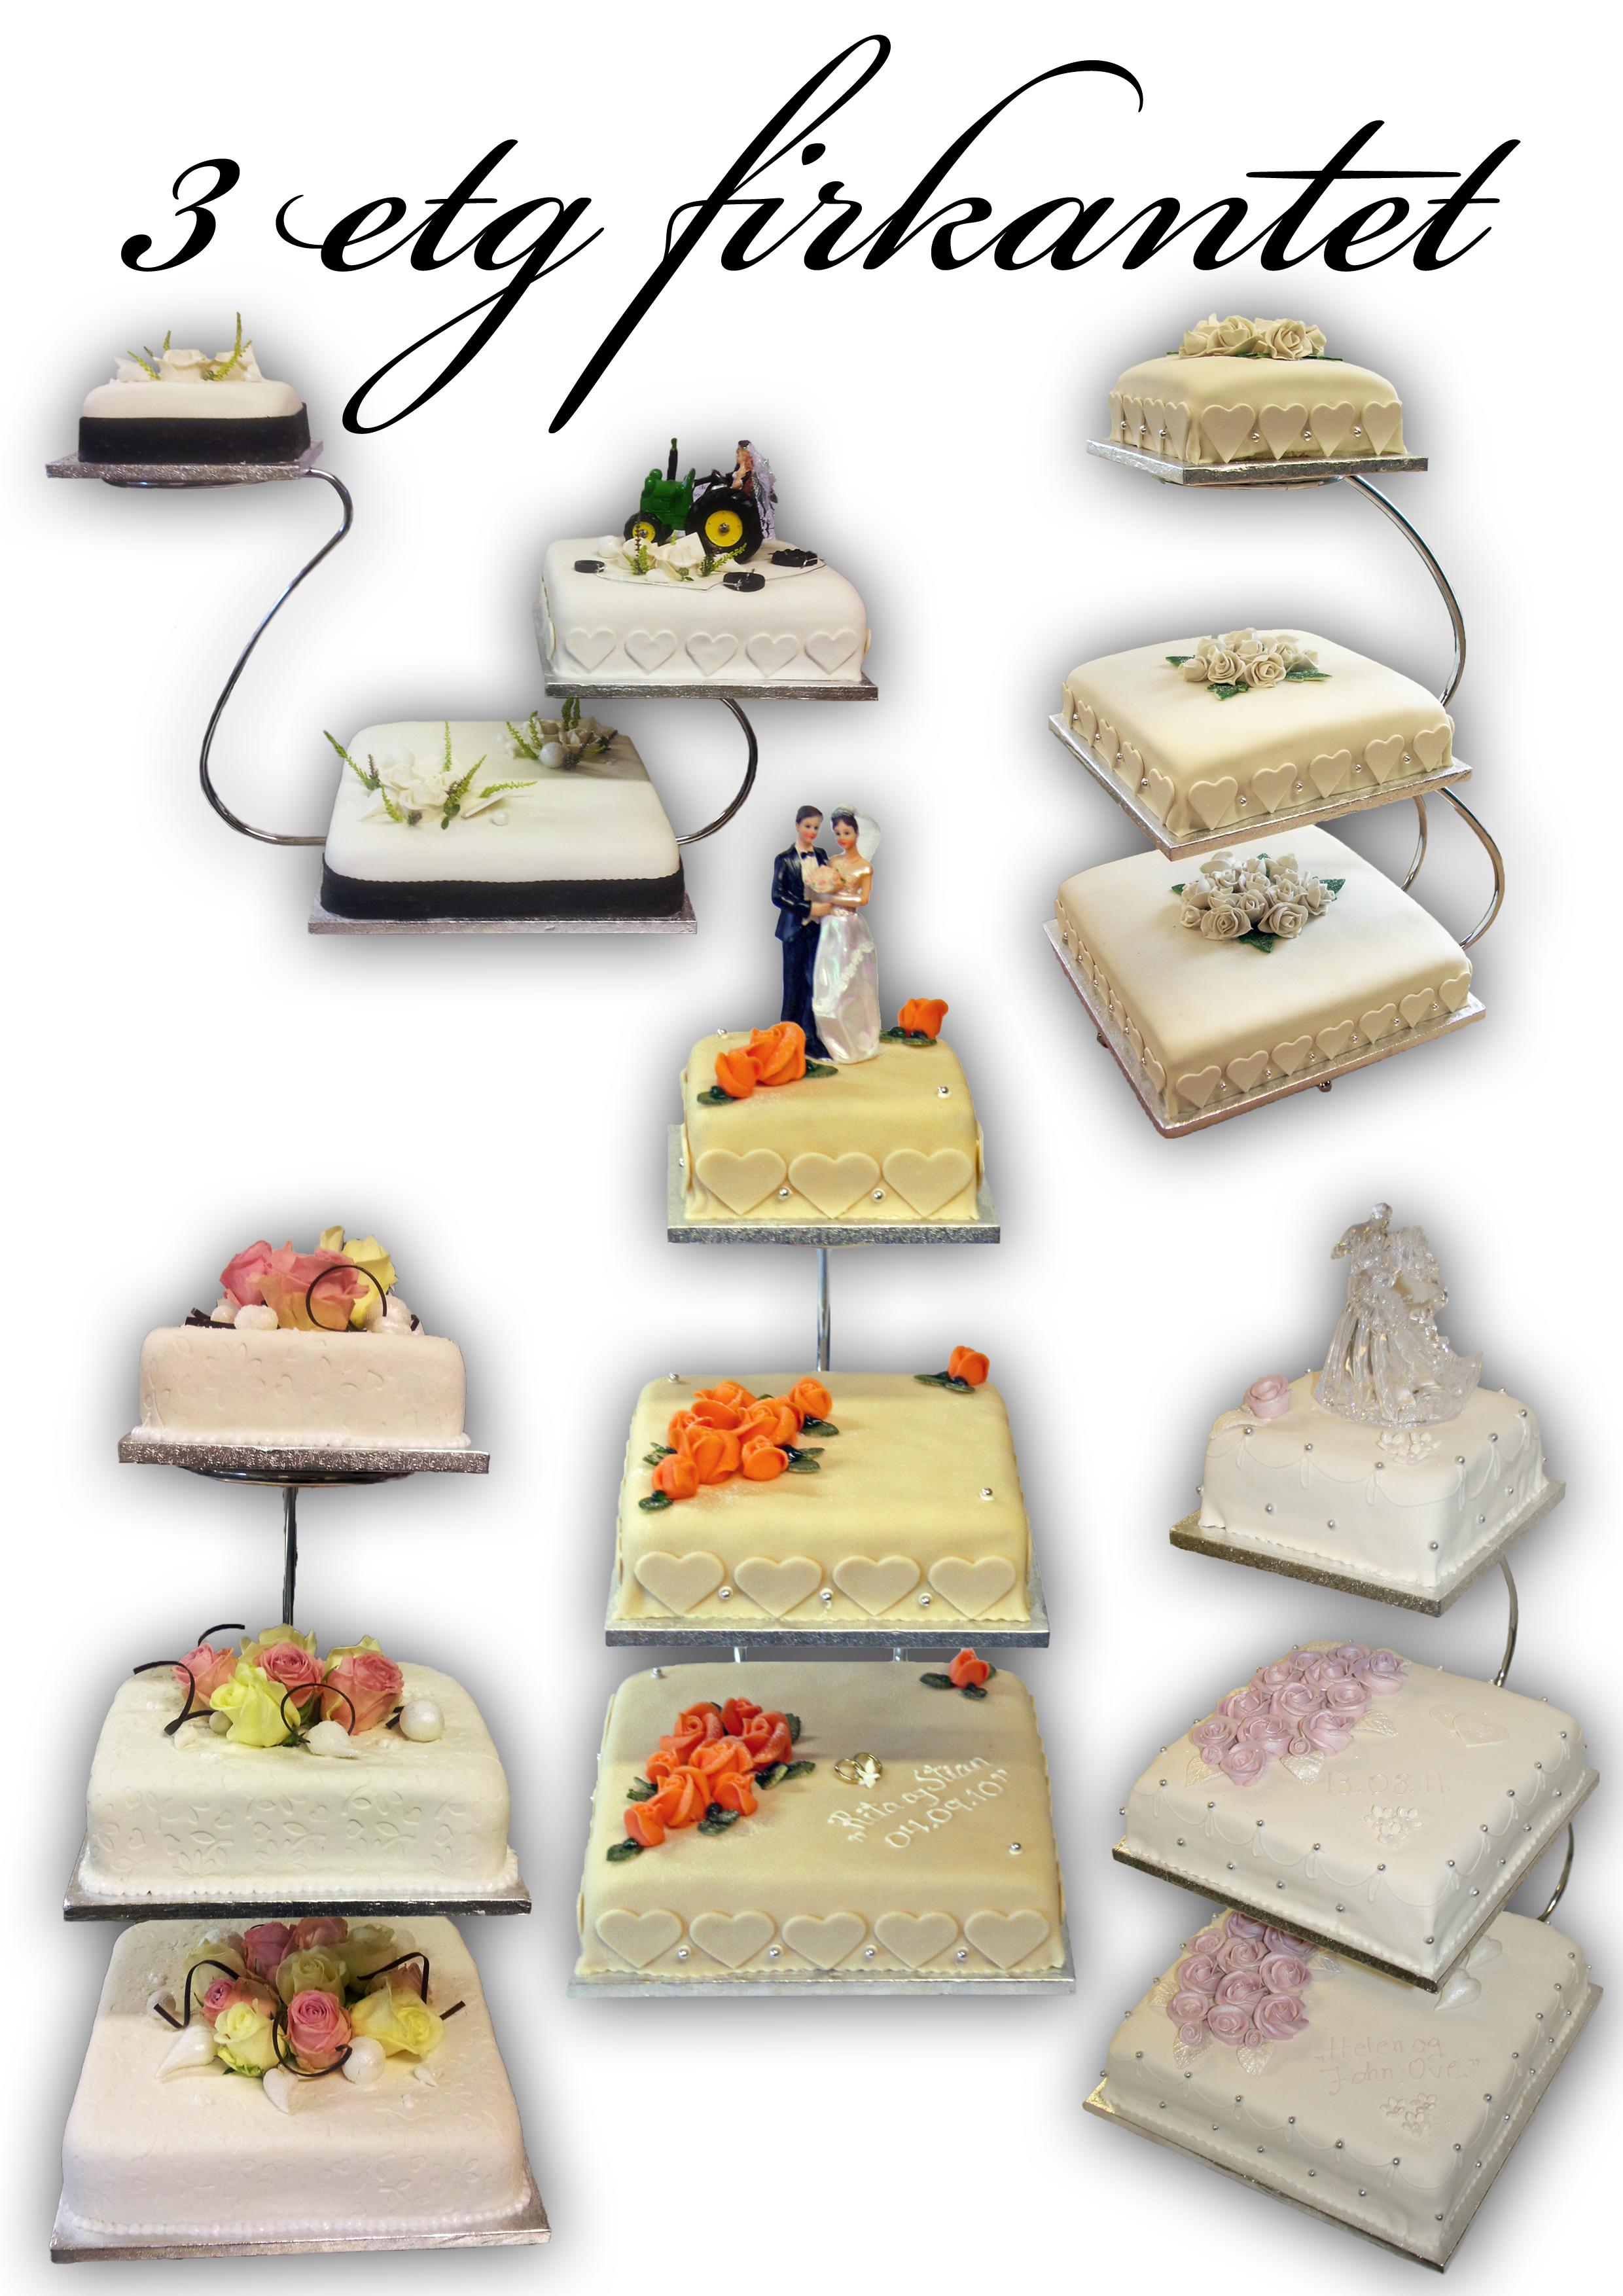 Bryllupskaker 3 etg firkantet bryllup